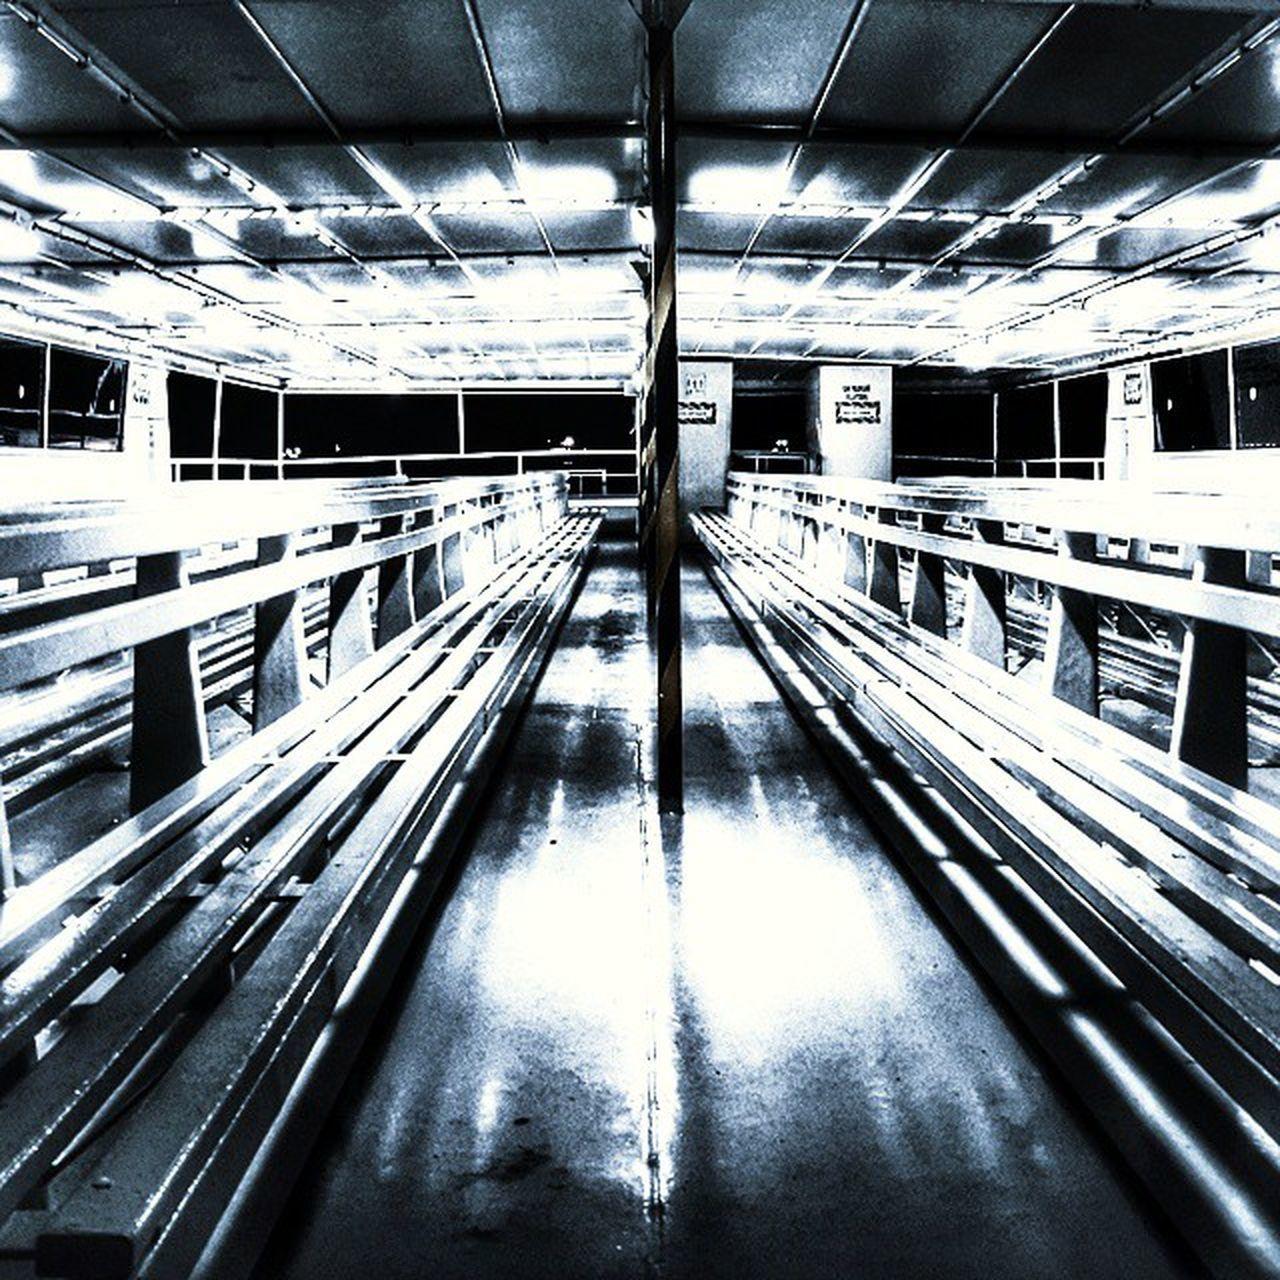 indoors, no people, technology, illuminated, day, supermarket